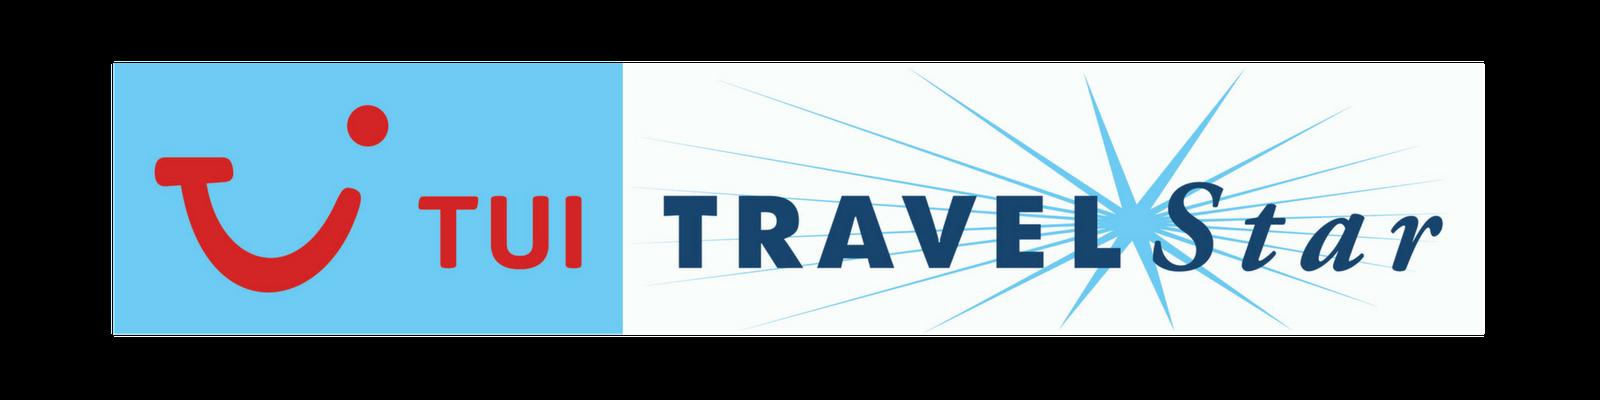 TUI-Travel-Star-logo.png